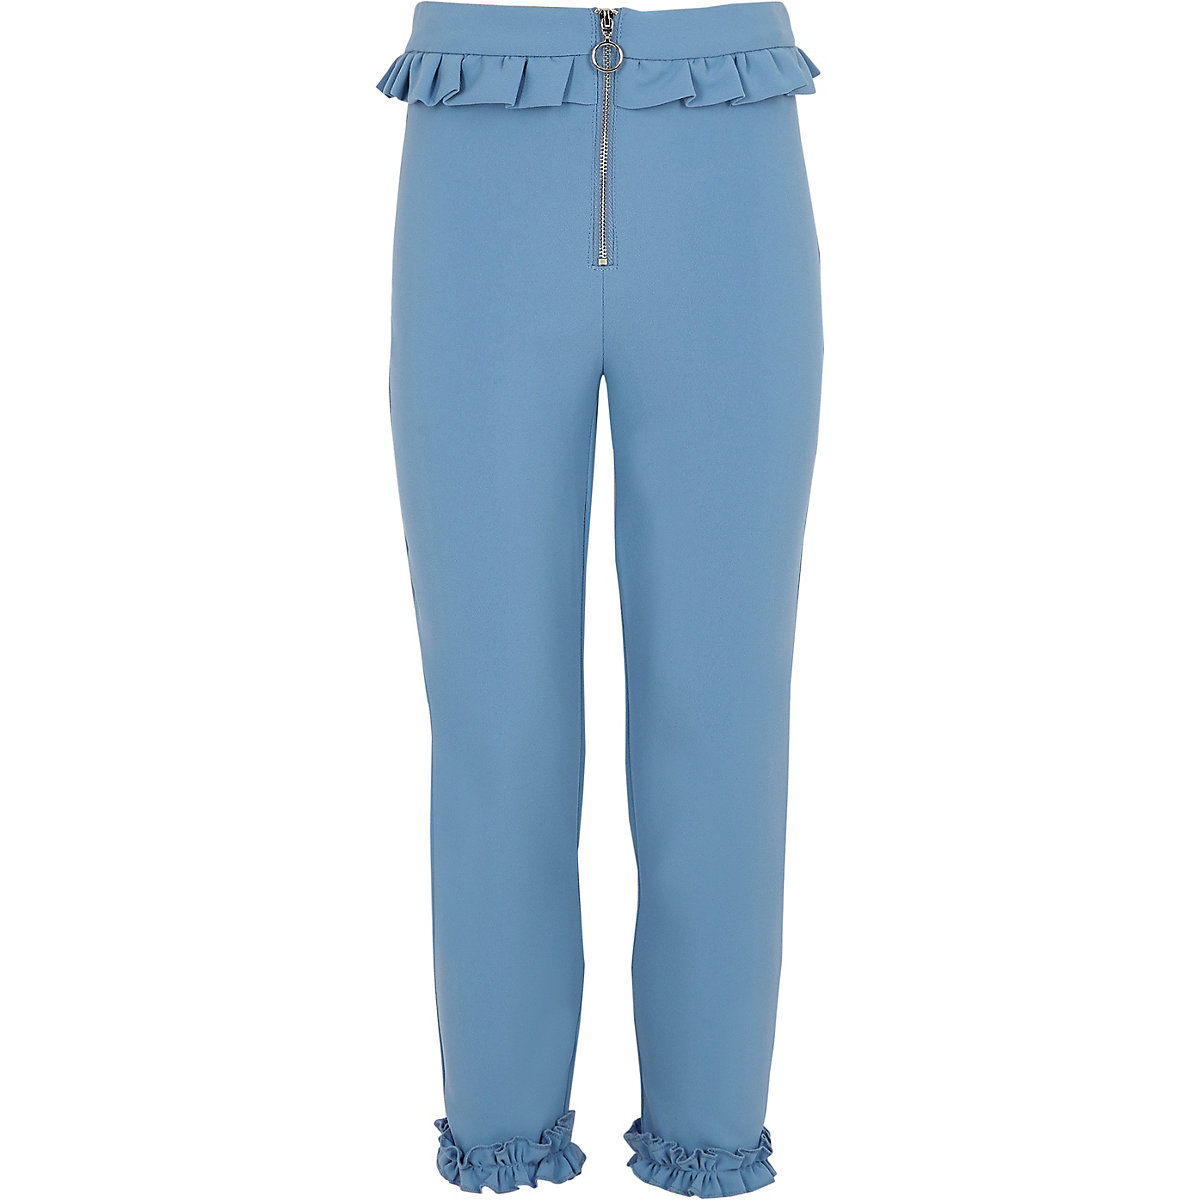 Girls blue frill zip cigarette trousers